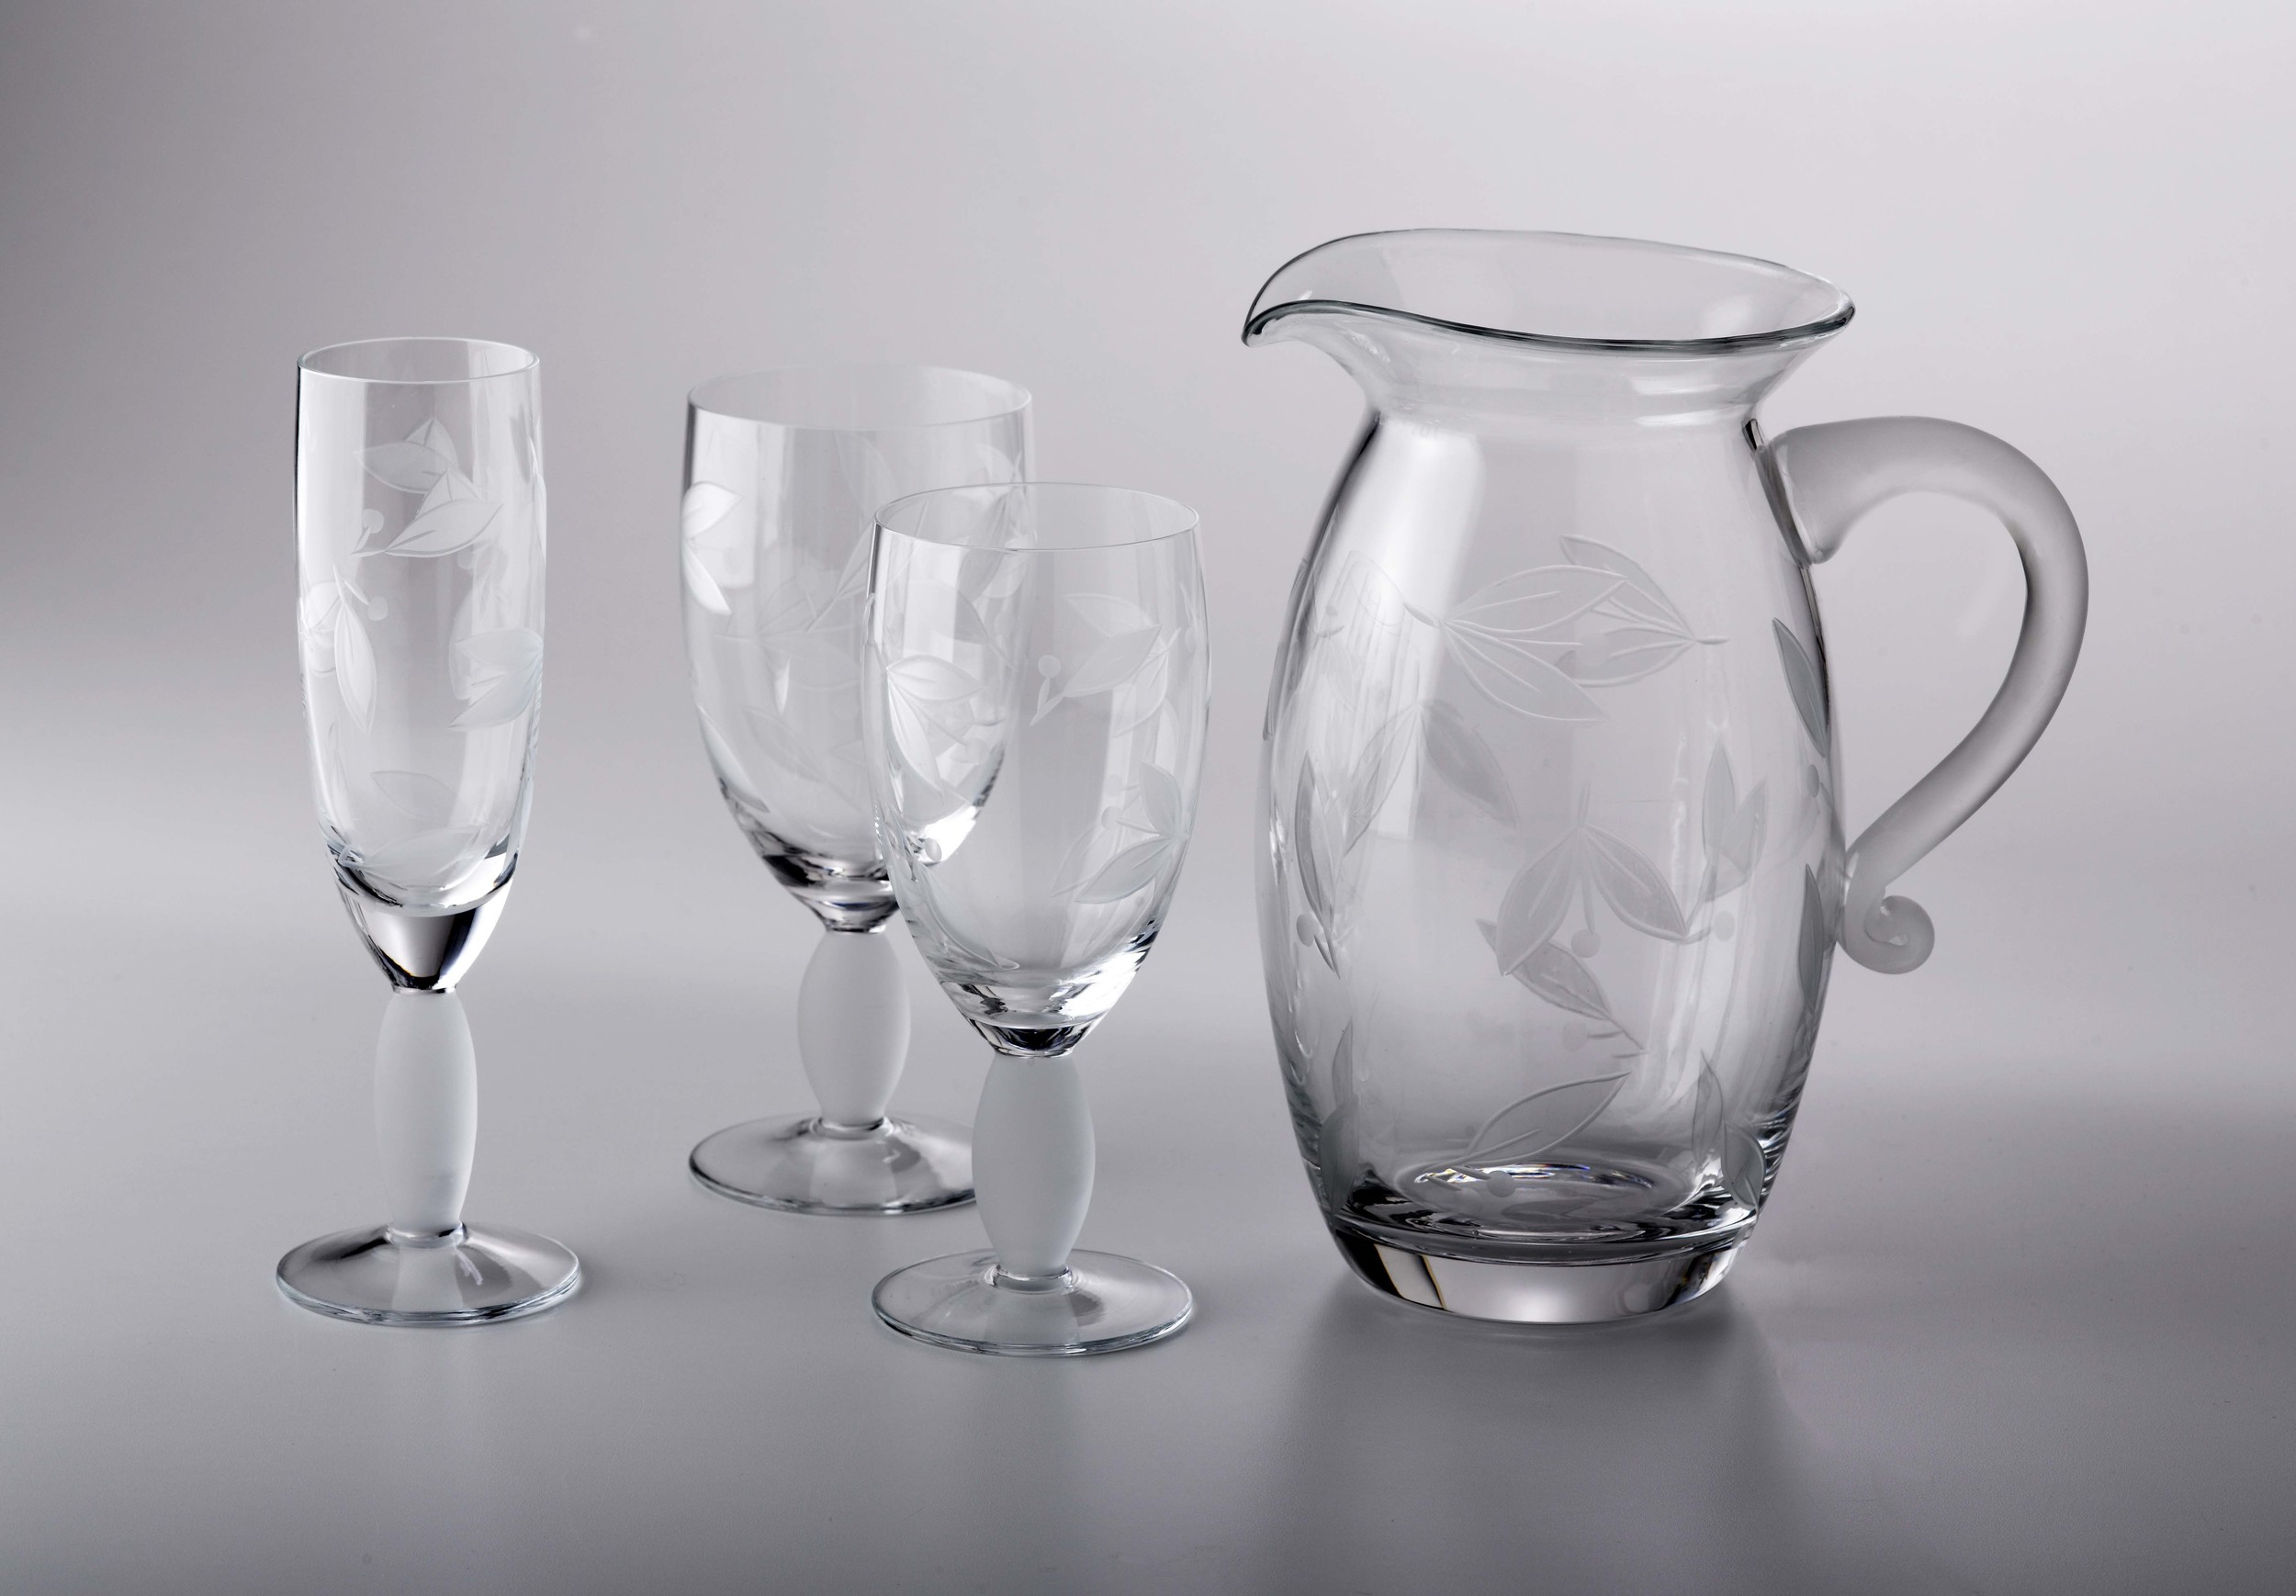 Floating Leaves glass copy.jpg